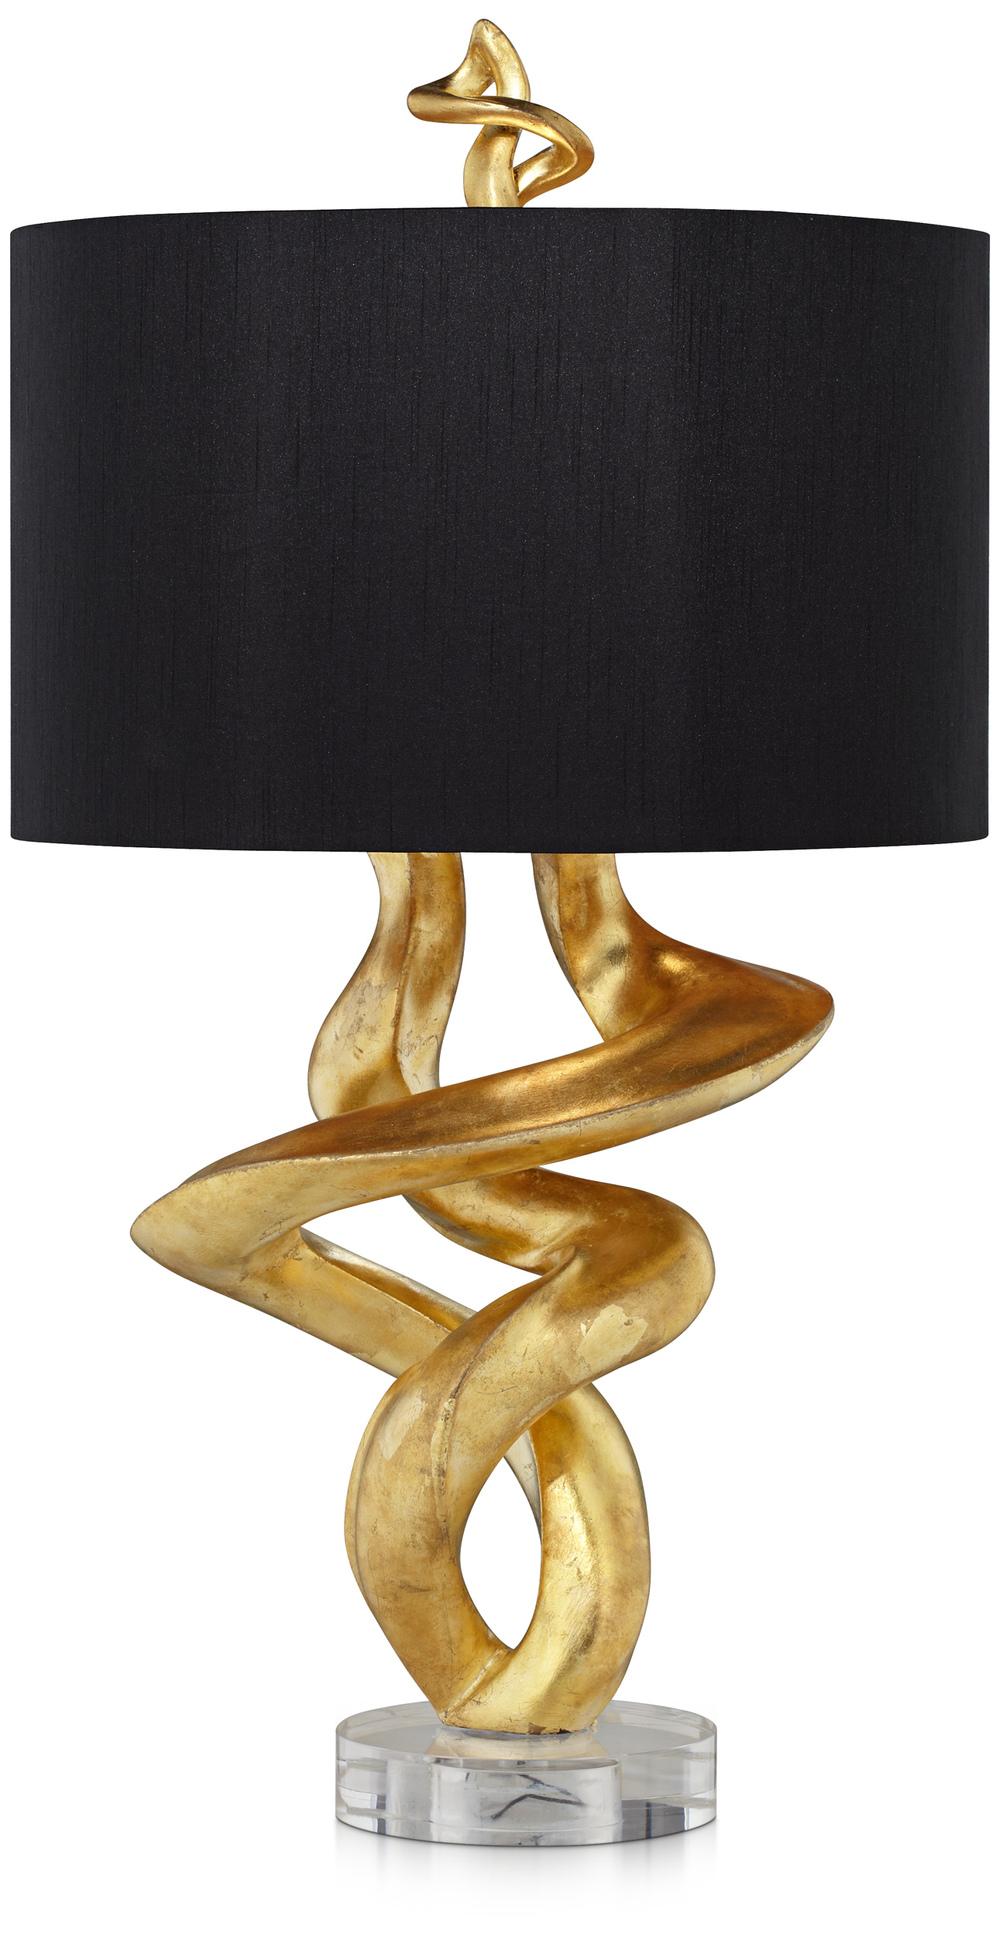 Pacific Coast Lighting - Tribal Impressions Table Lamp